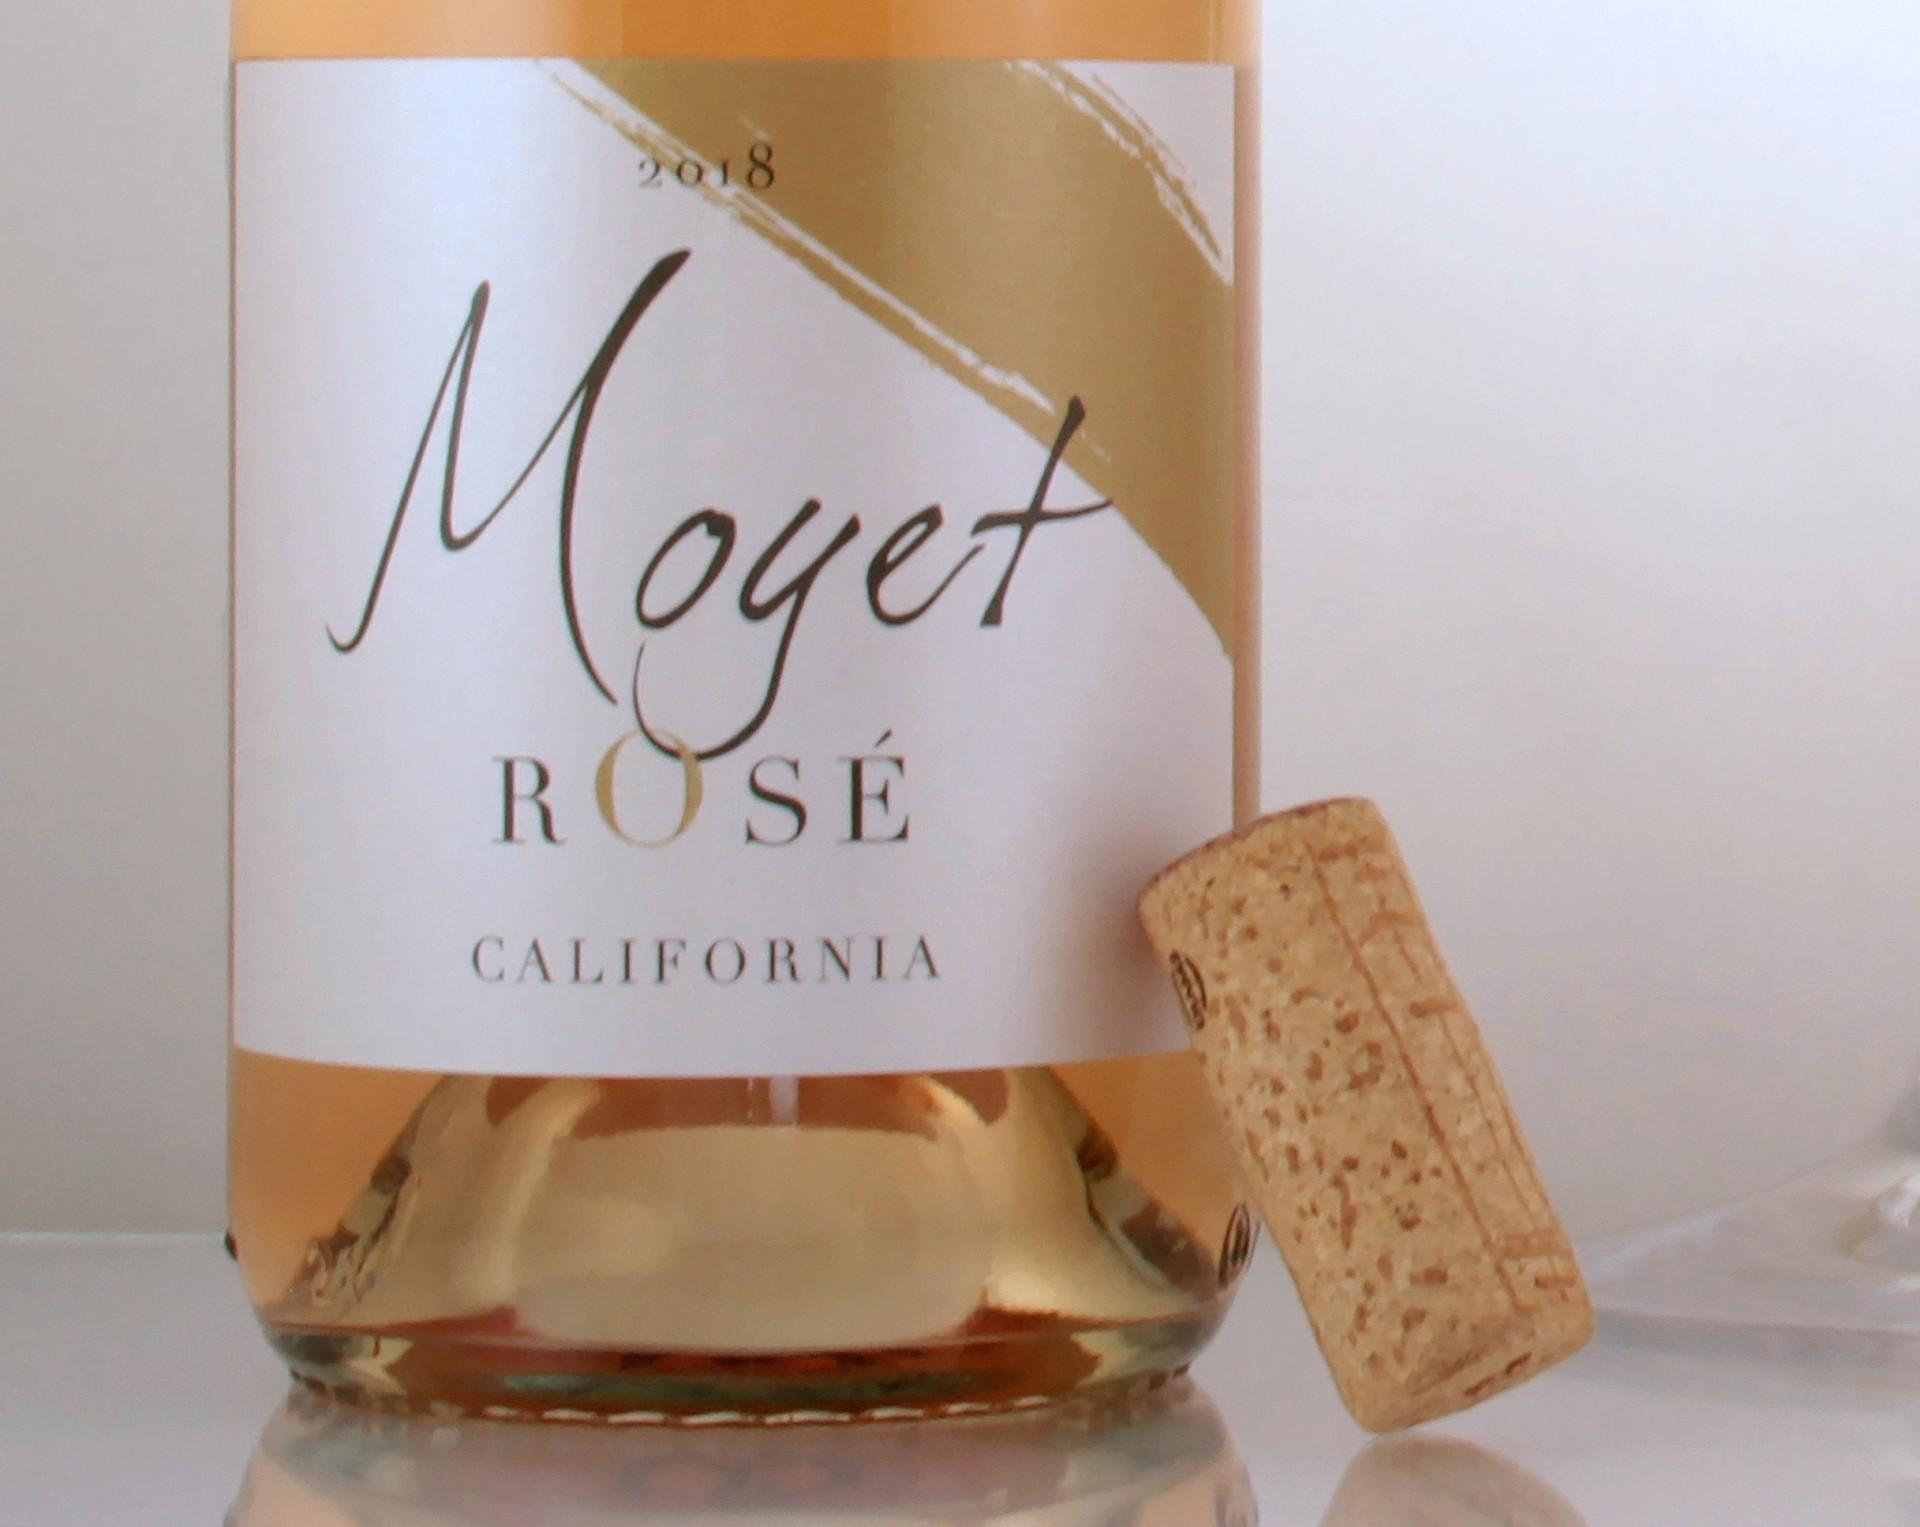 Moyet Rosé: A Wine Celebrating the Name